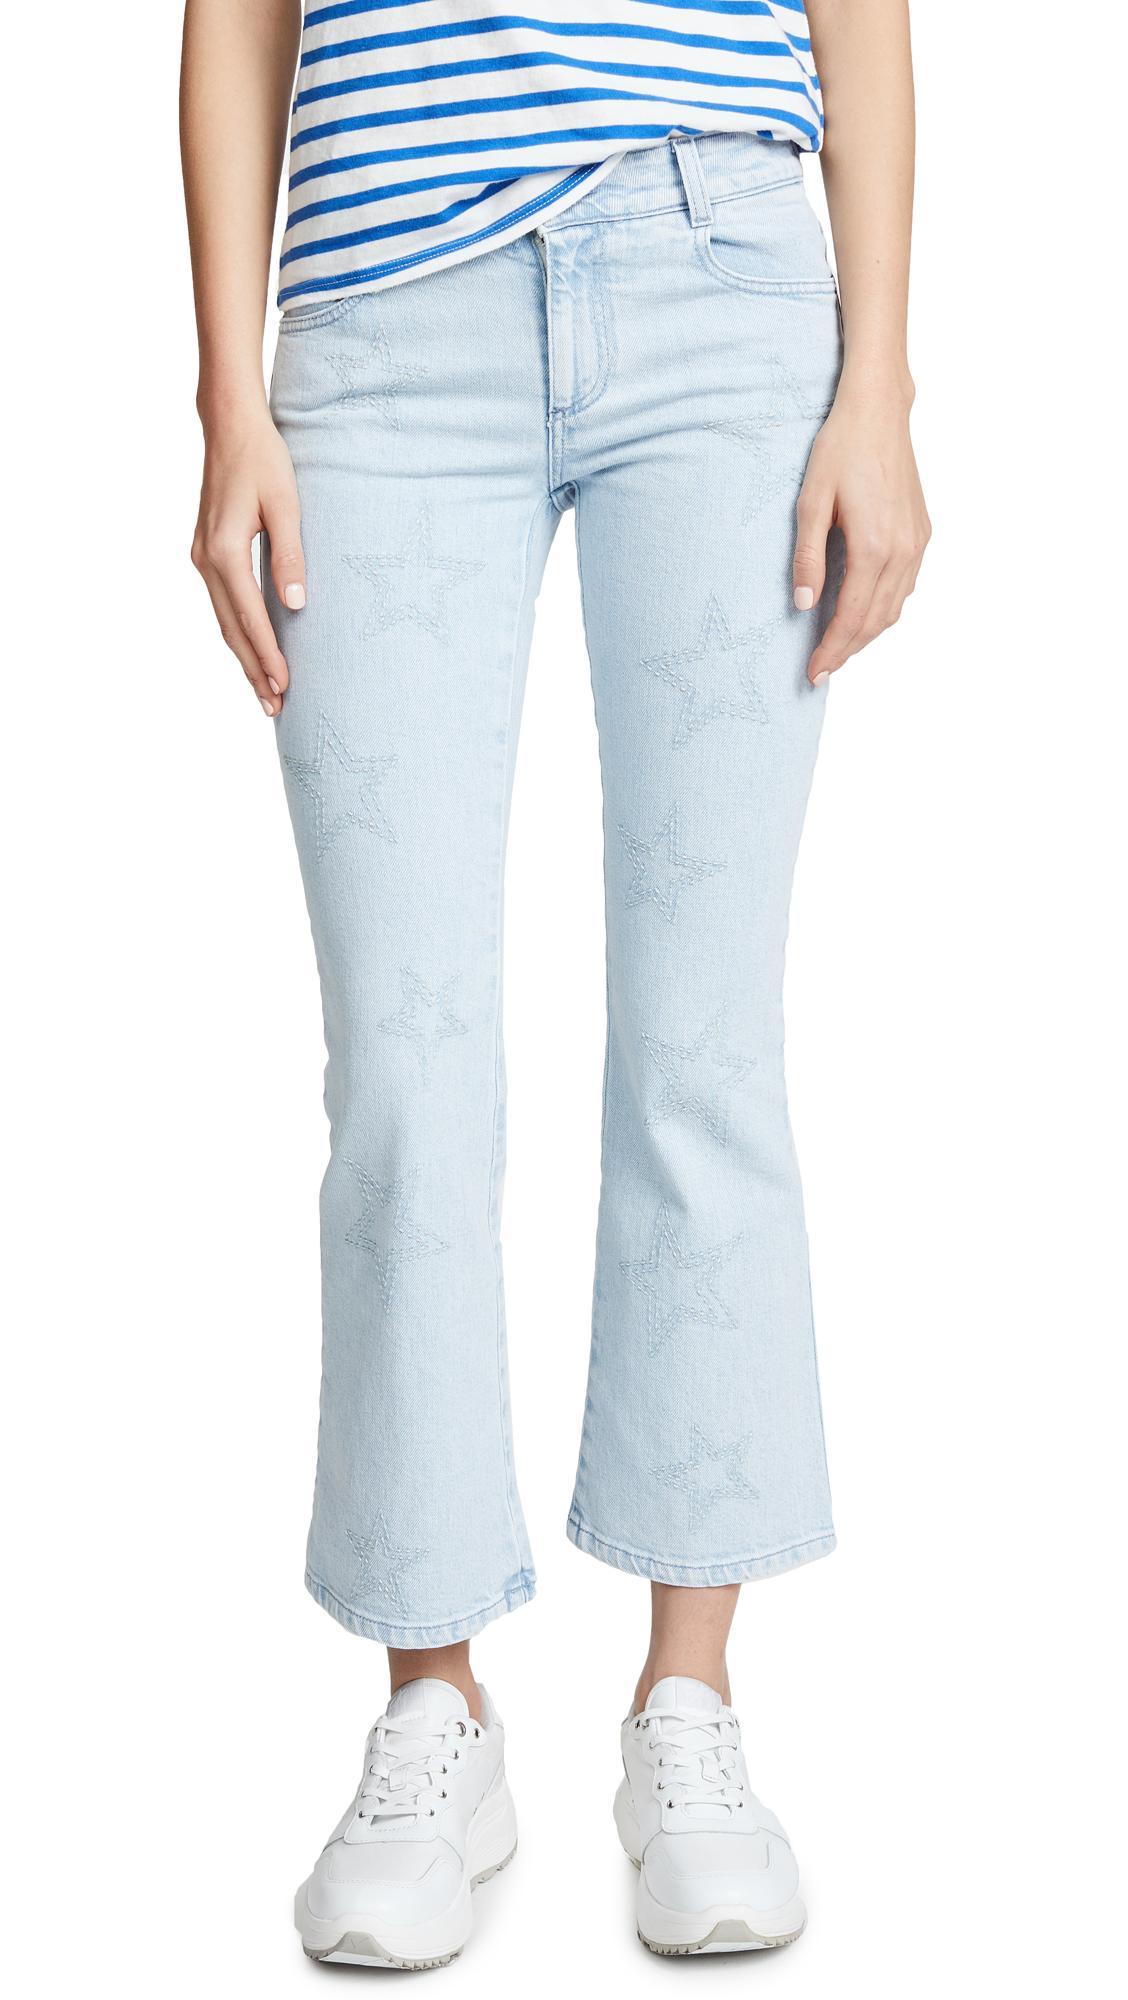 Stella Mccartney The Skinny Light Wash Flare Jeans In Azzurro